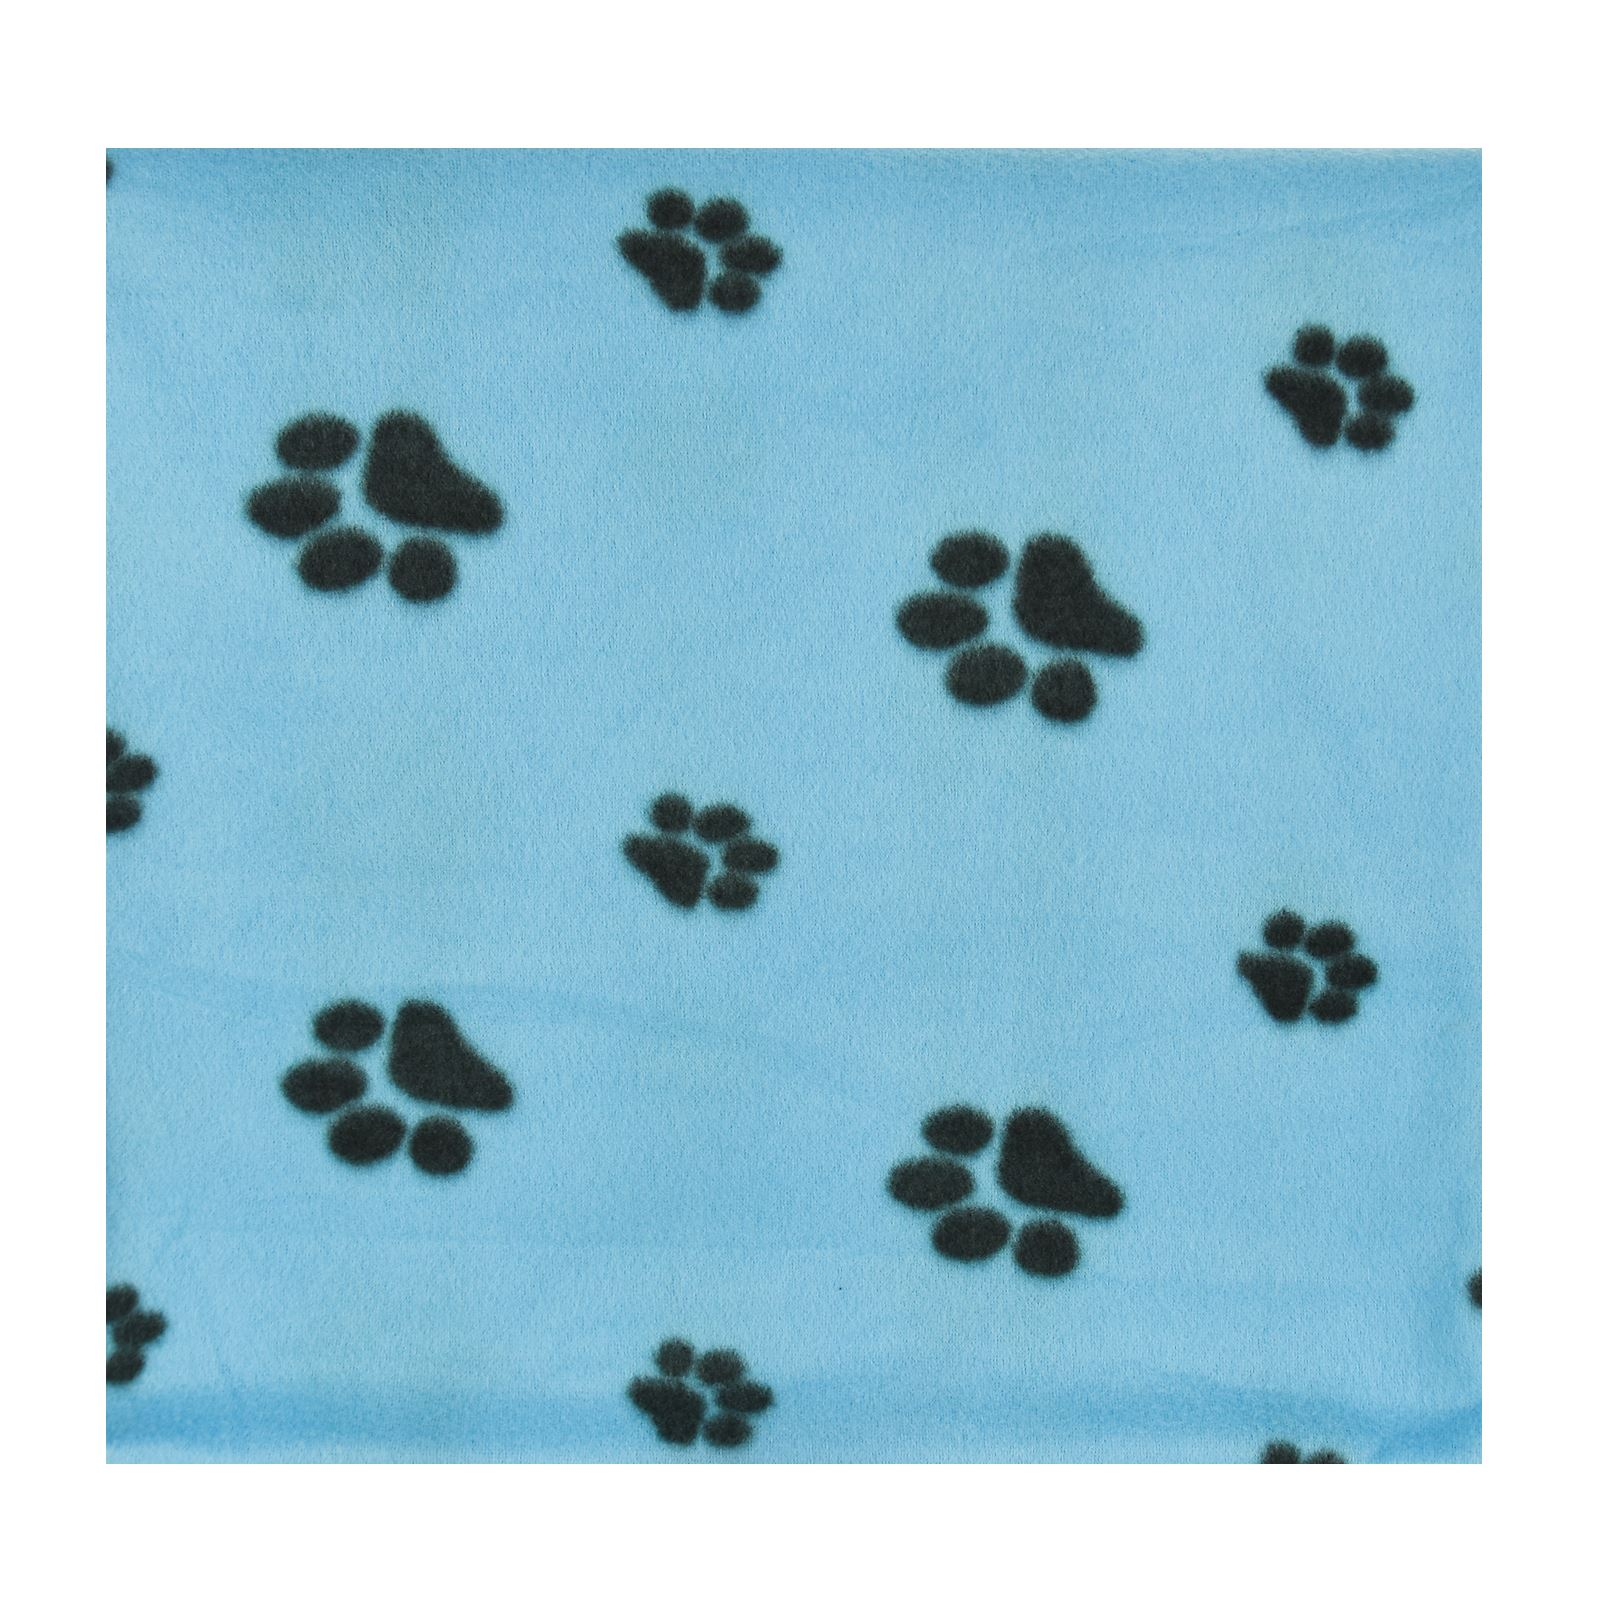 Warm-Pet-Mat-Paw-Print-Cat-Dog-Puppy-Fleece-Soft-Blanket-Bed-Cushion-One-Size thumbnail 12